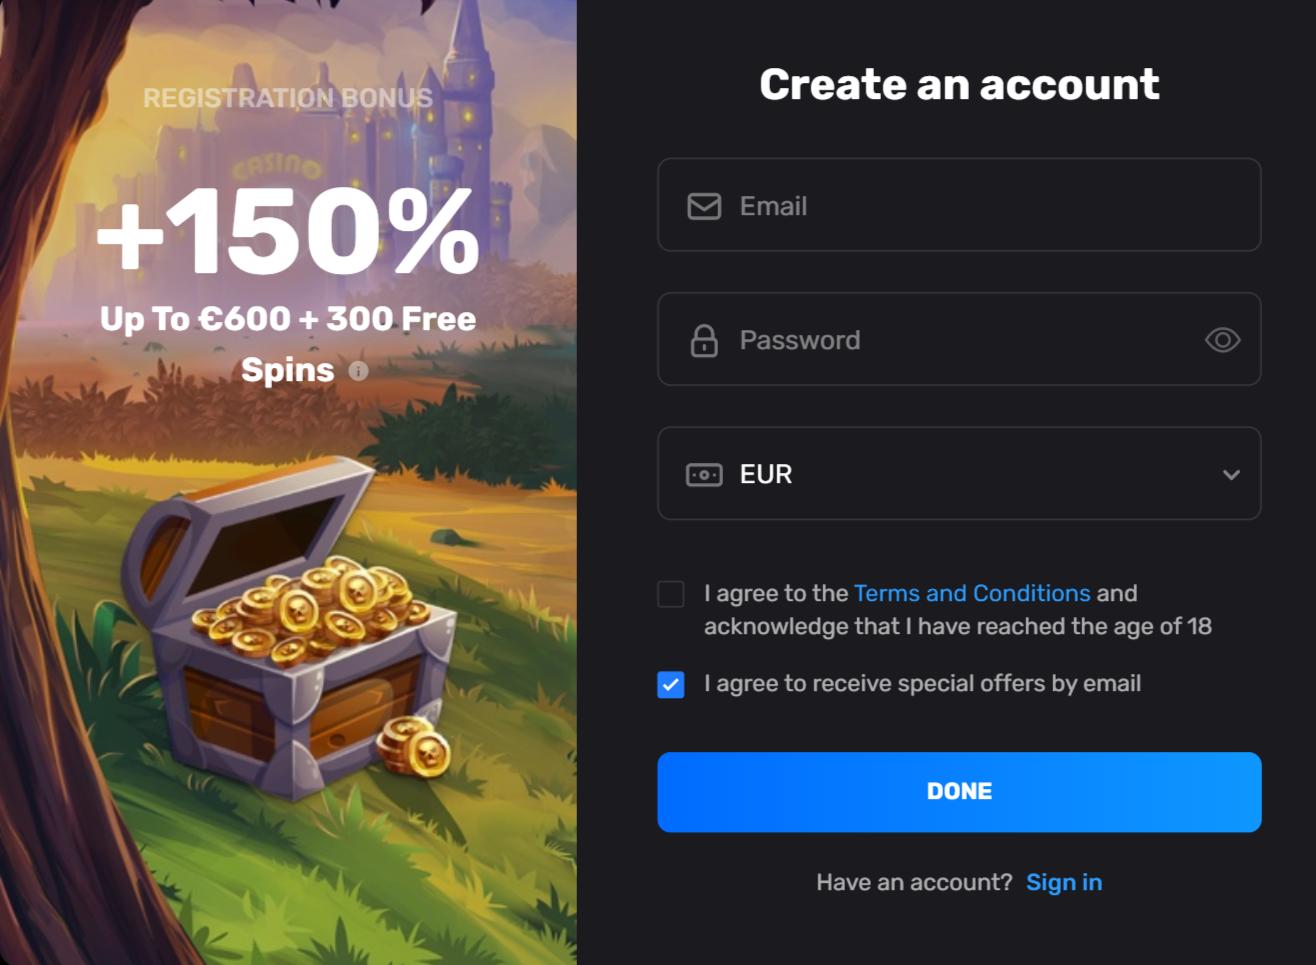 casinomia casino bonus free spins - 150% first deposit bonus 600€ chest golden coins weekend reload bonus - casinomia no deposit bonus code promo code